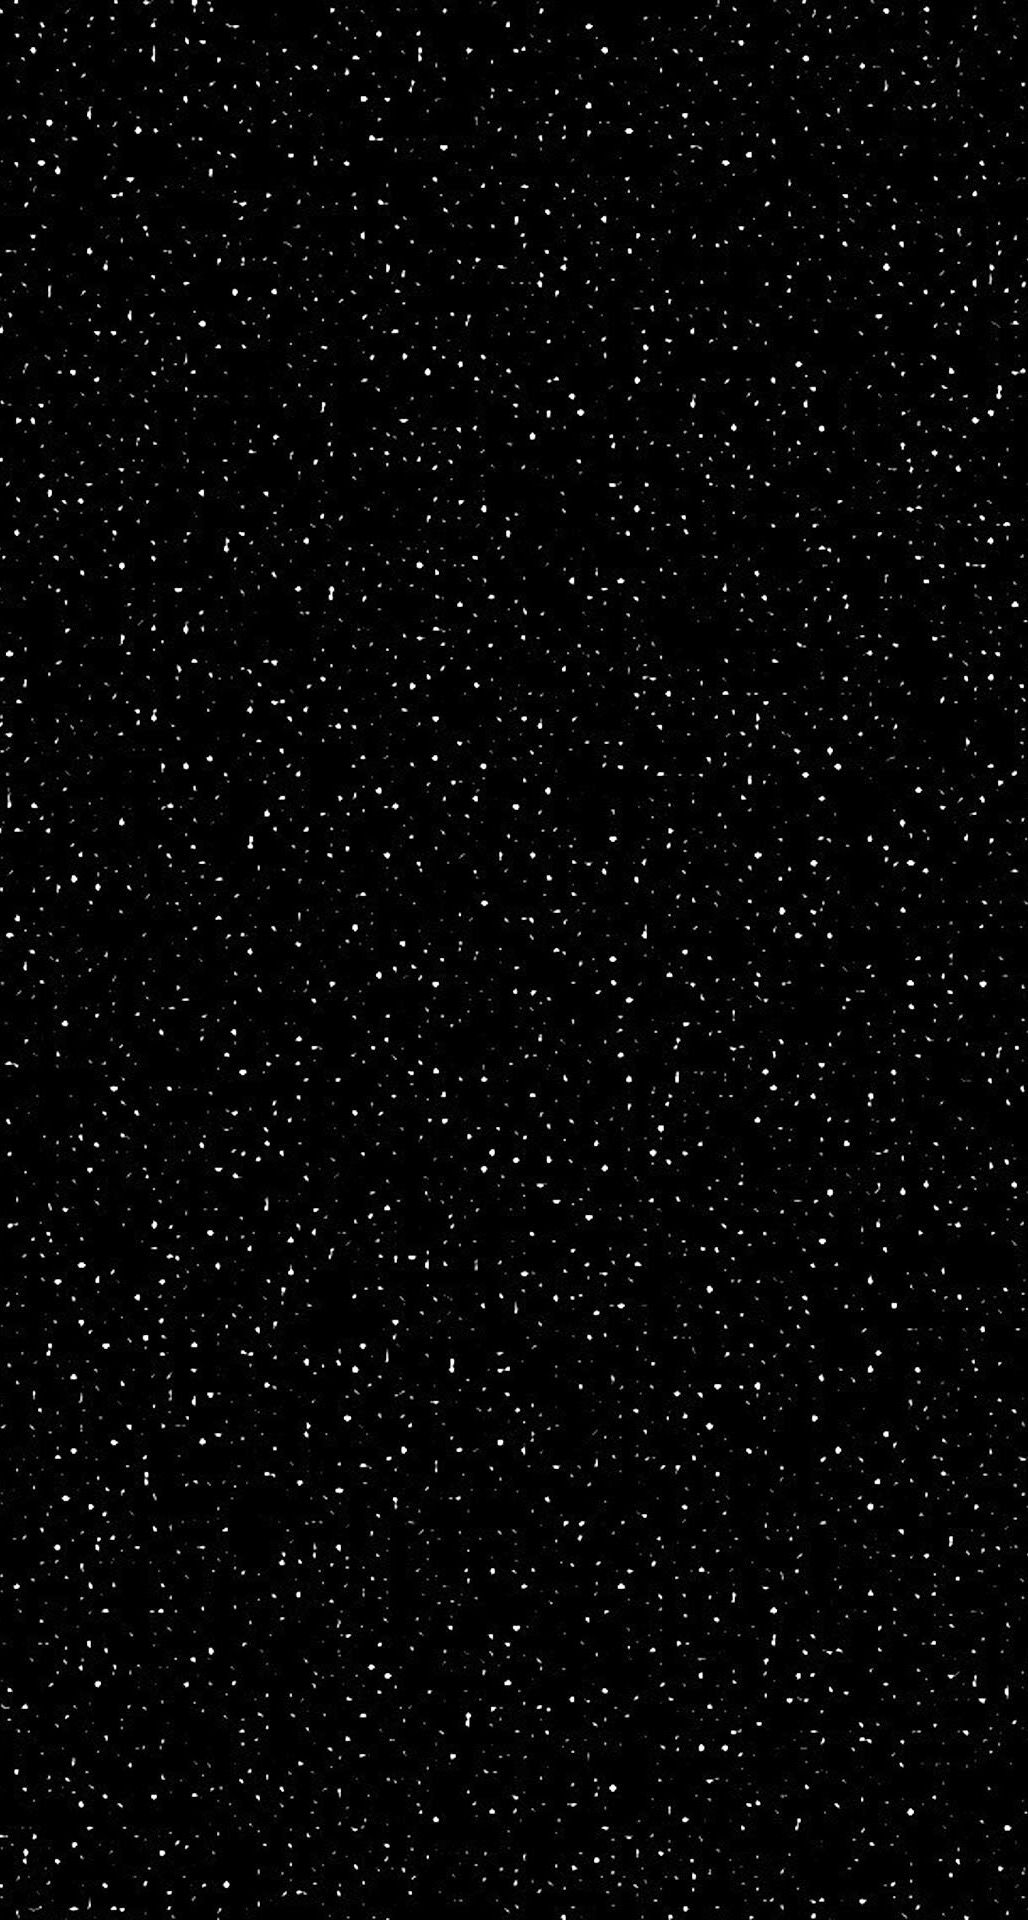 50 Space Iphone Wallpaper Simple Phone Wallpapers Space Iphone Wallpaper Galaxy Phone Wallpaper